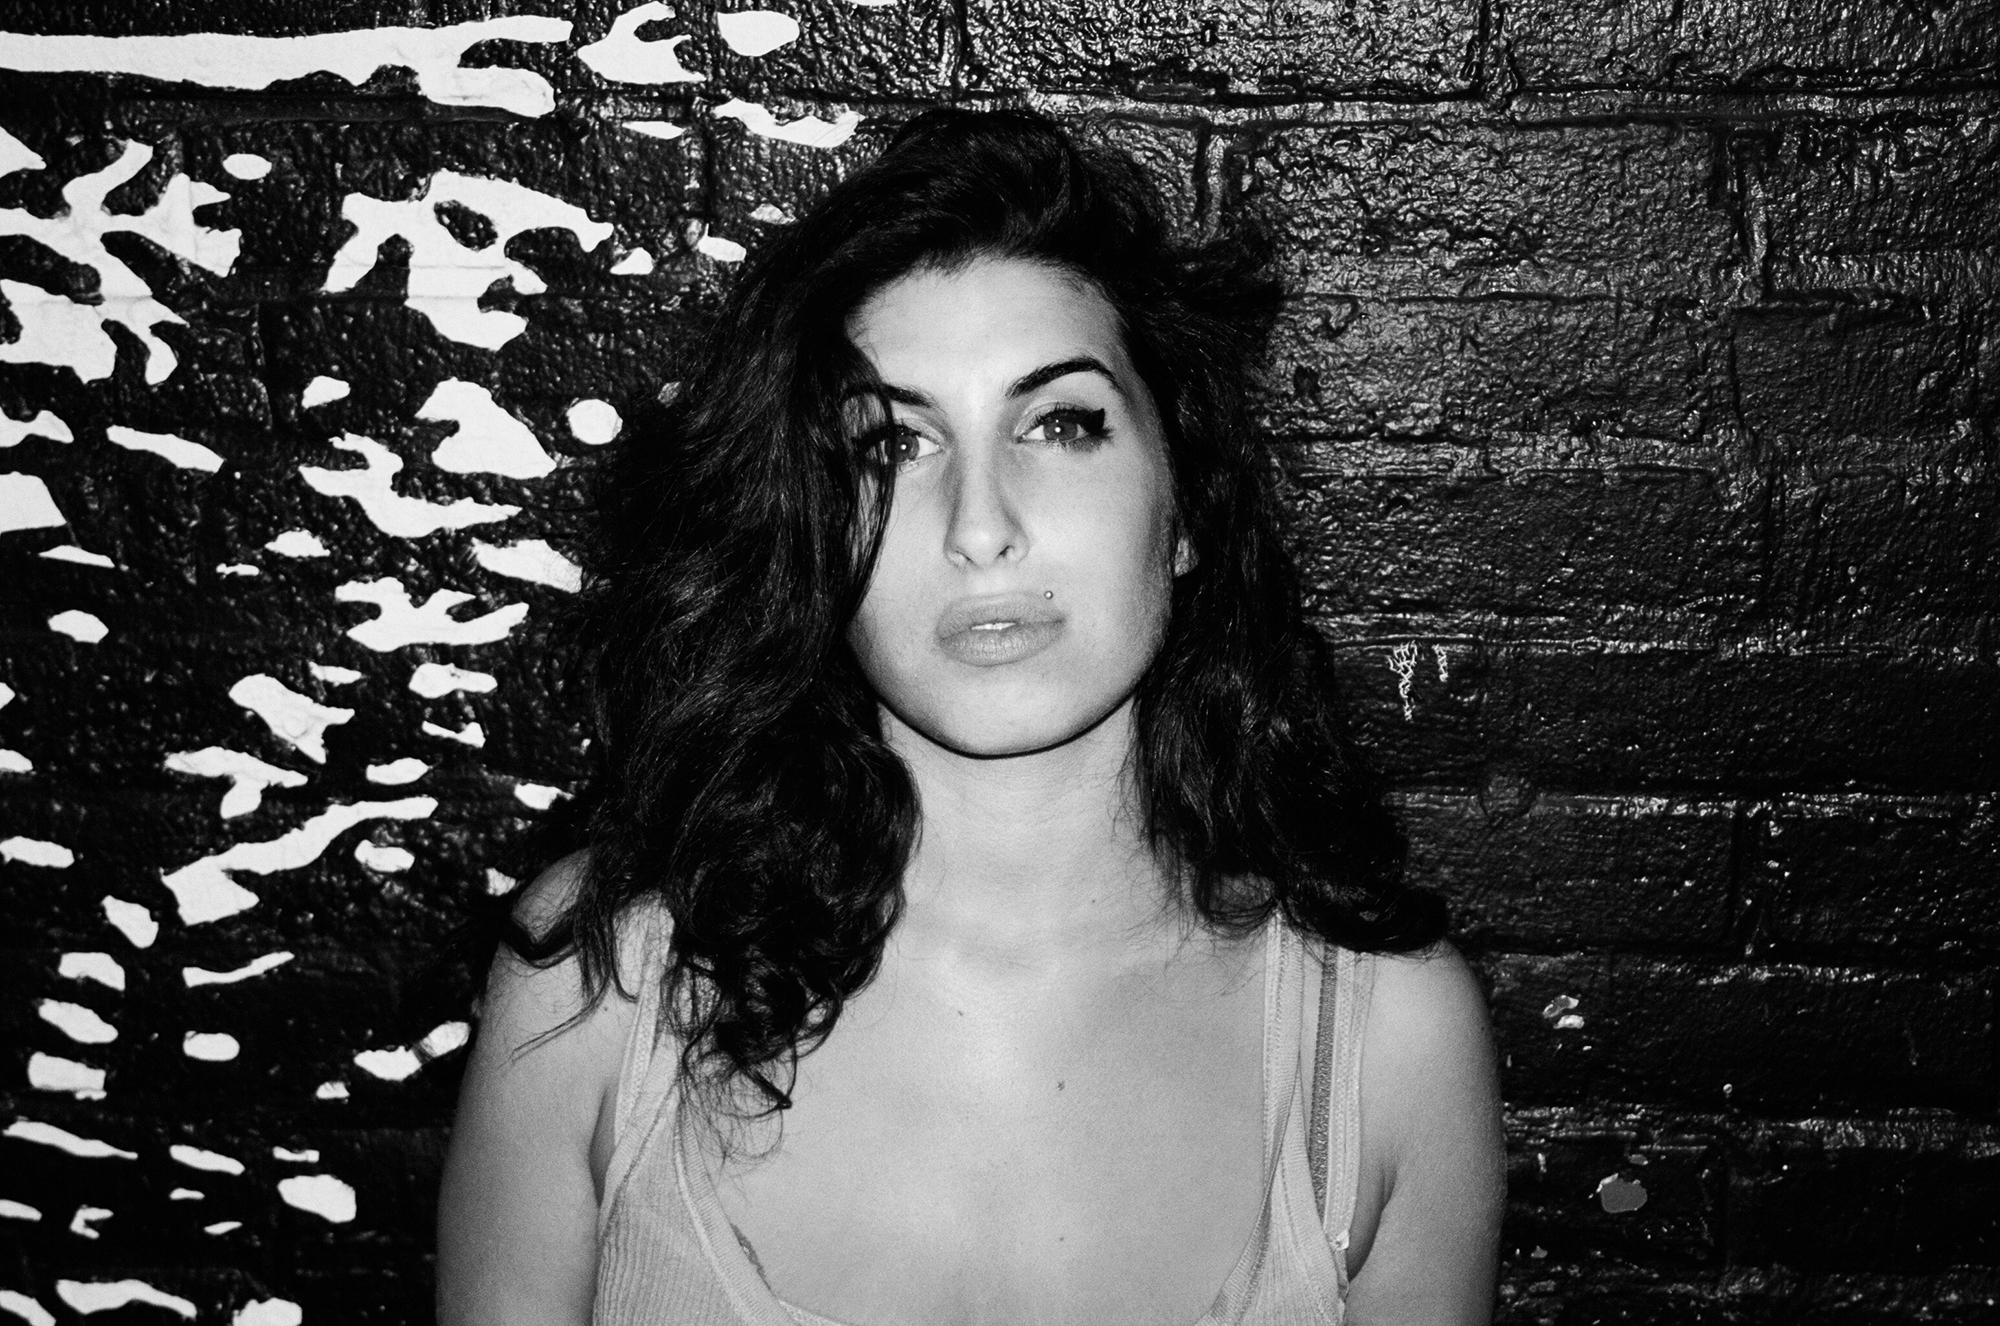 Amy Winehouse Wallpaper For Windows 2000x1326 Download Hd Wallpaper Wallpapertip